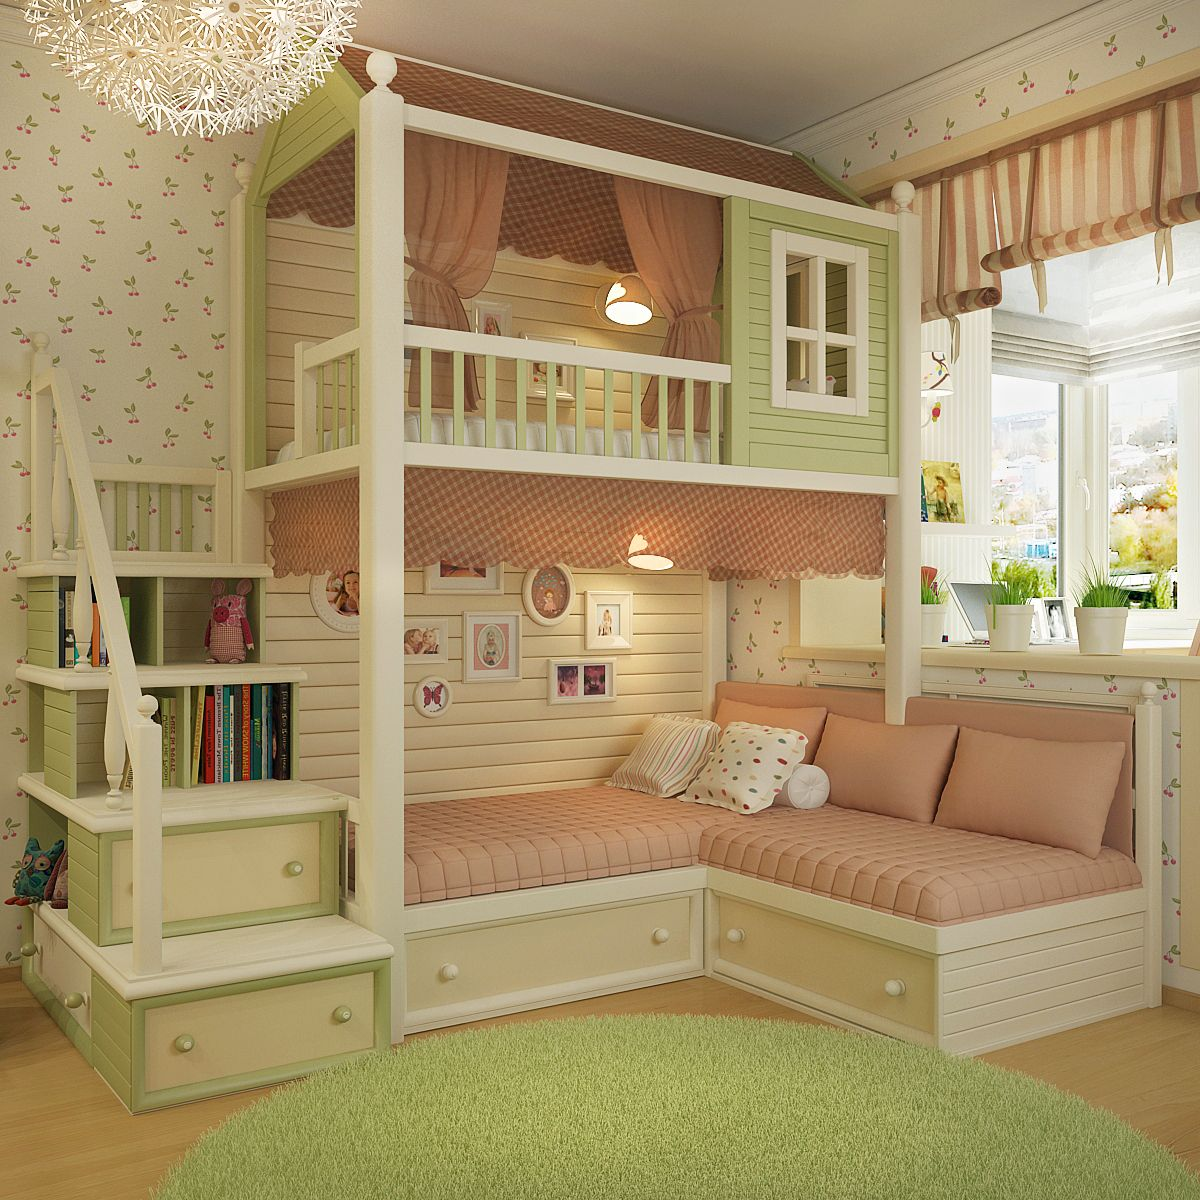 marvelous Pretty Bedrooms For Kids Part - 16: Bedroom Ideas, Kids Bedroom, Kids Rooms, Playhouses, Beautiful Bedrooms, Pretty  Bedroom, Beds, Child Room, Kidsroom